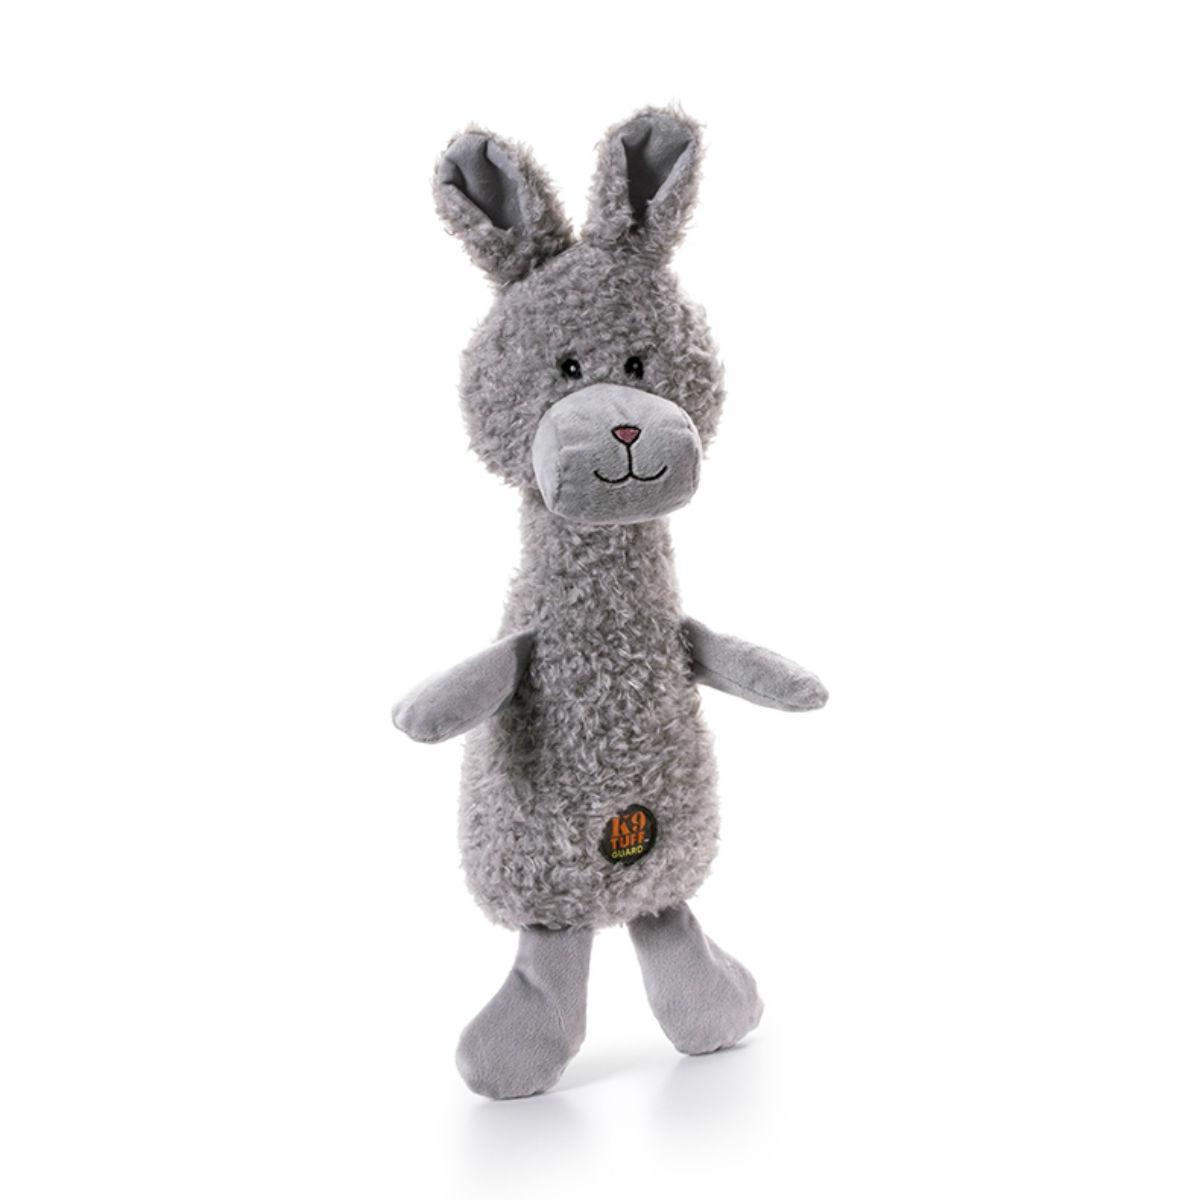 Charming Scruffles Dog Toy - Bunny